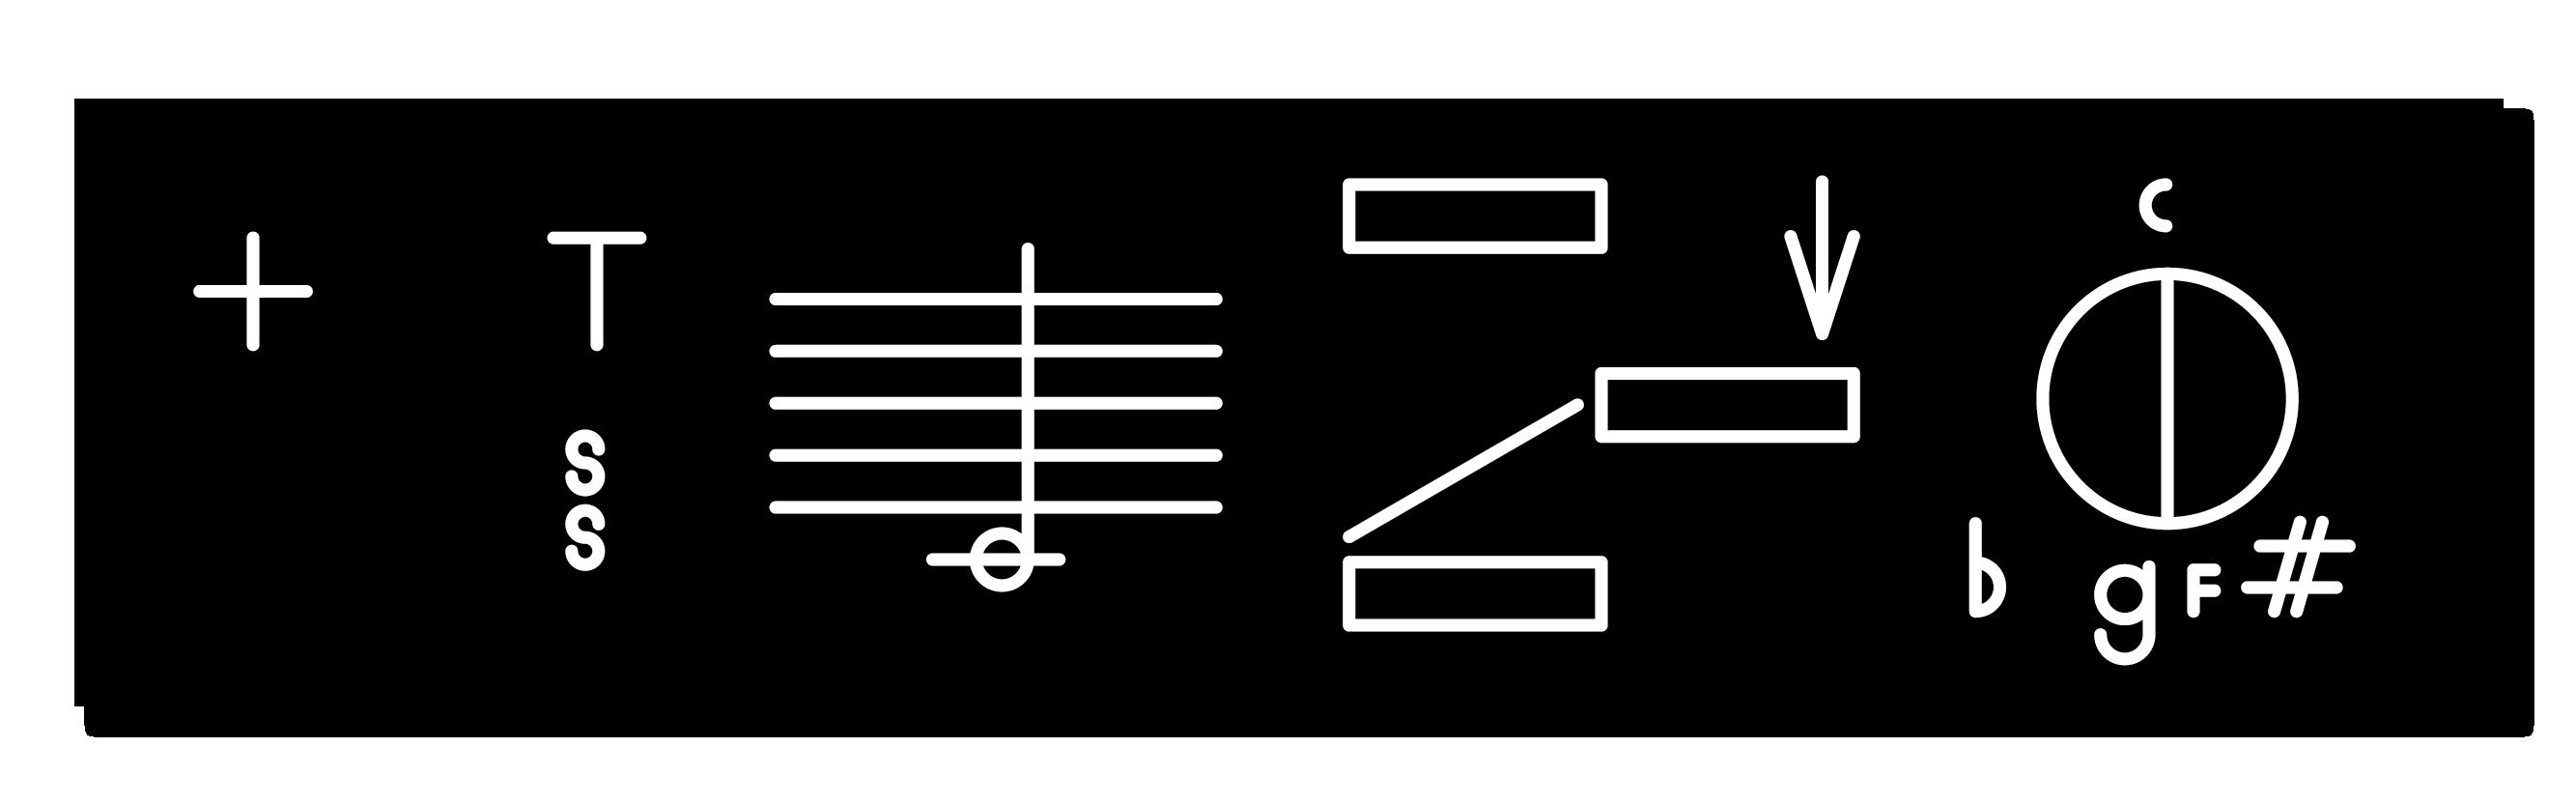 Dante Carlos, *Satanic Harmony (C♮ +  F♯ / G♭)*, 2015. Engraved plastic, 2 x 8 inches (5 x 20.32 cm)